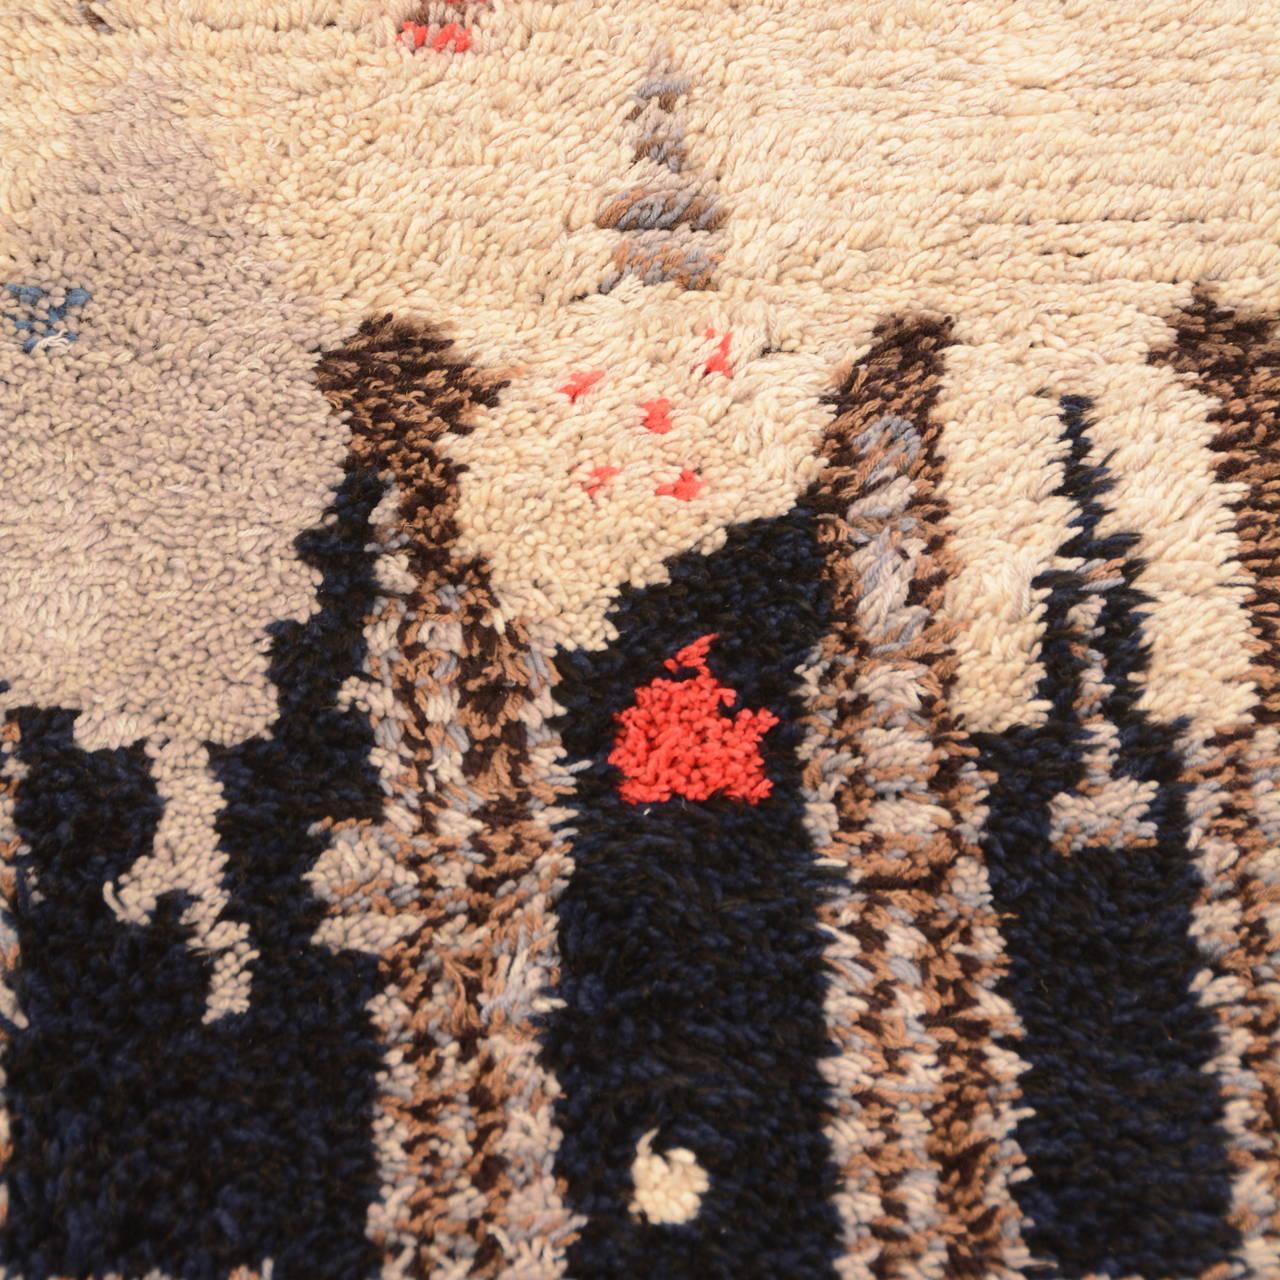 Midcentury Scandinavian Modern Rya Wool Rug Wall Hanging For Sale 1